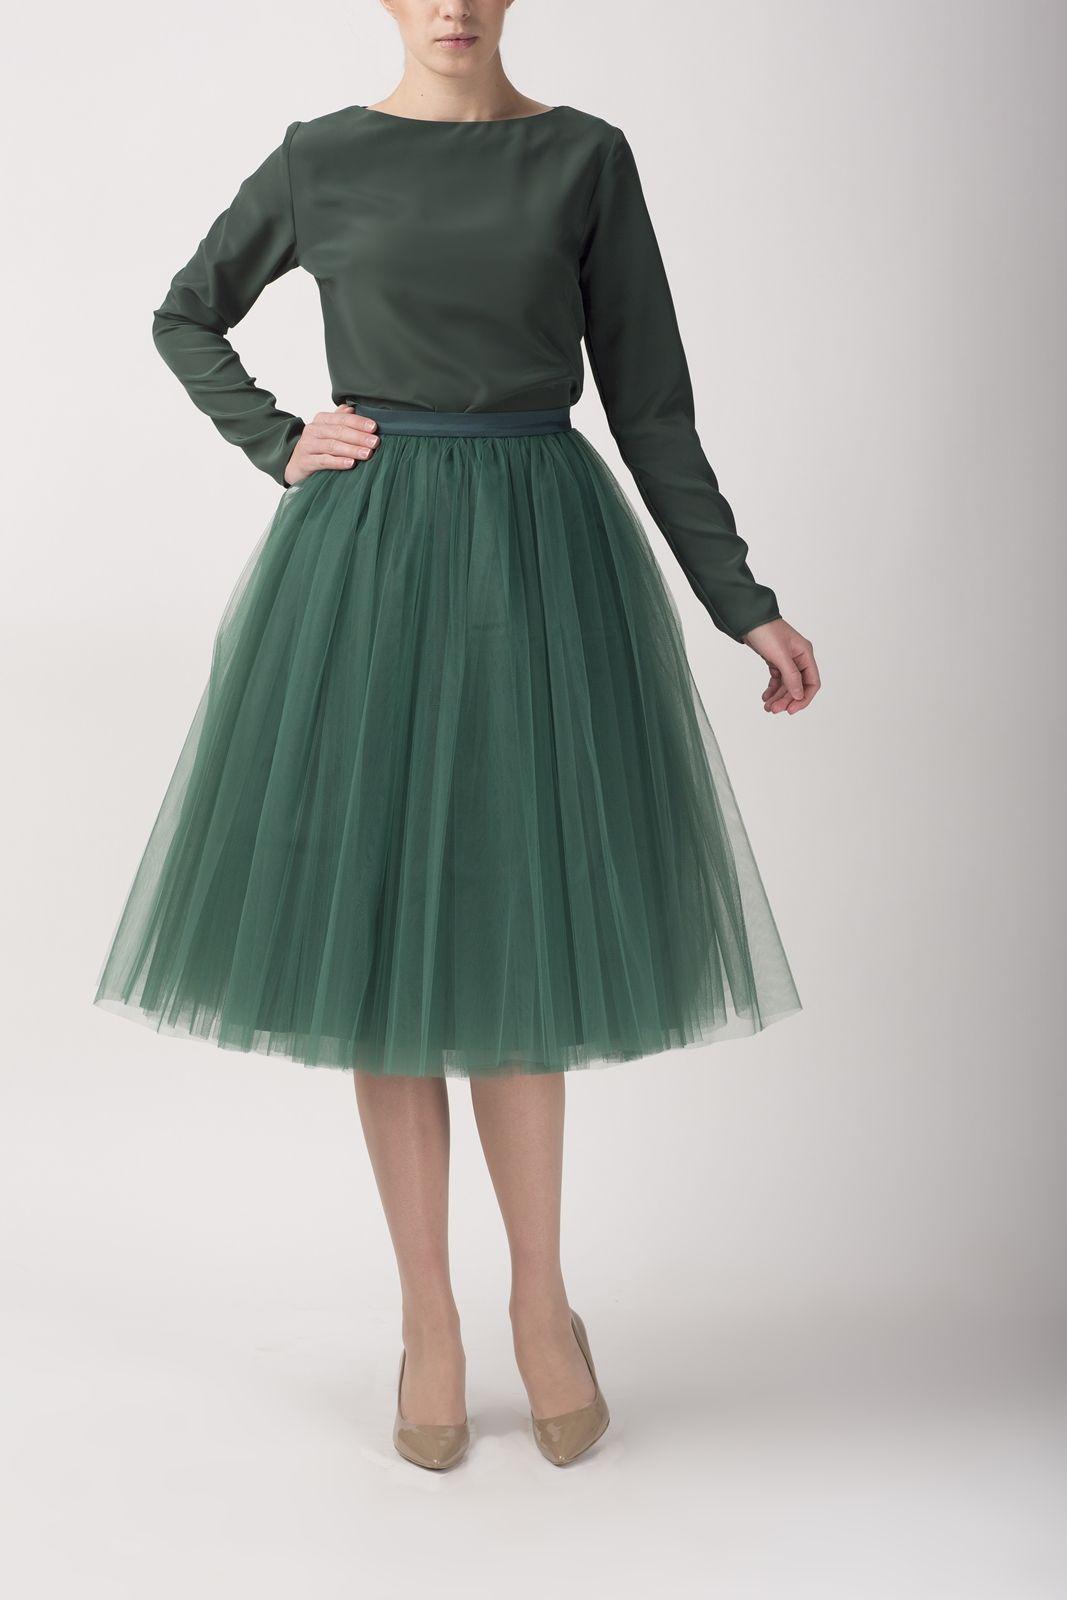 Bottle green tulle skirt and blouse by Fanfaronada | Styles ...